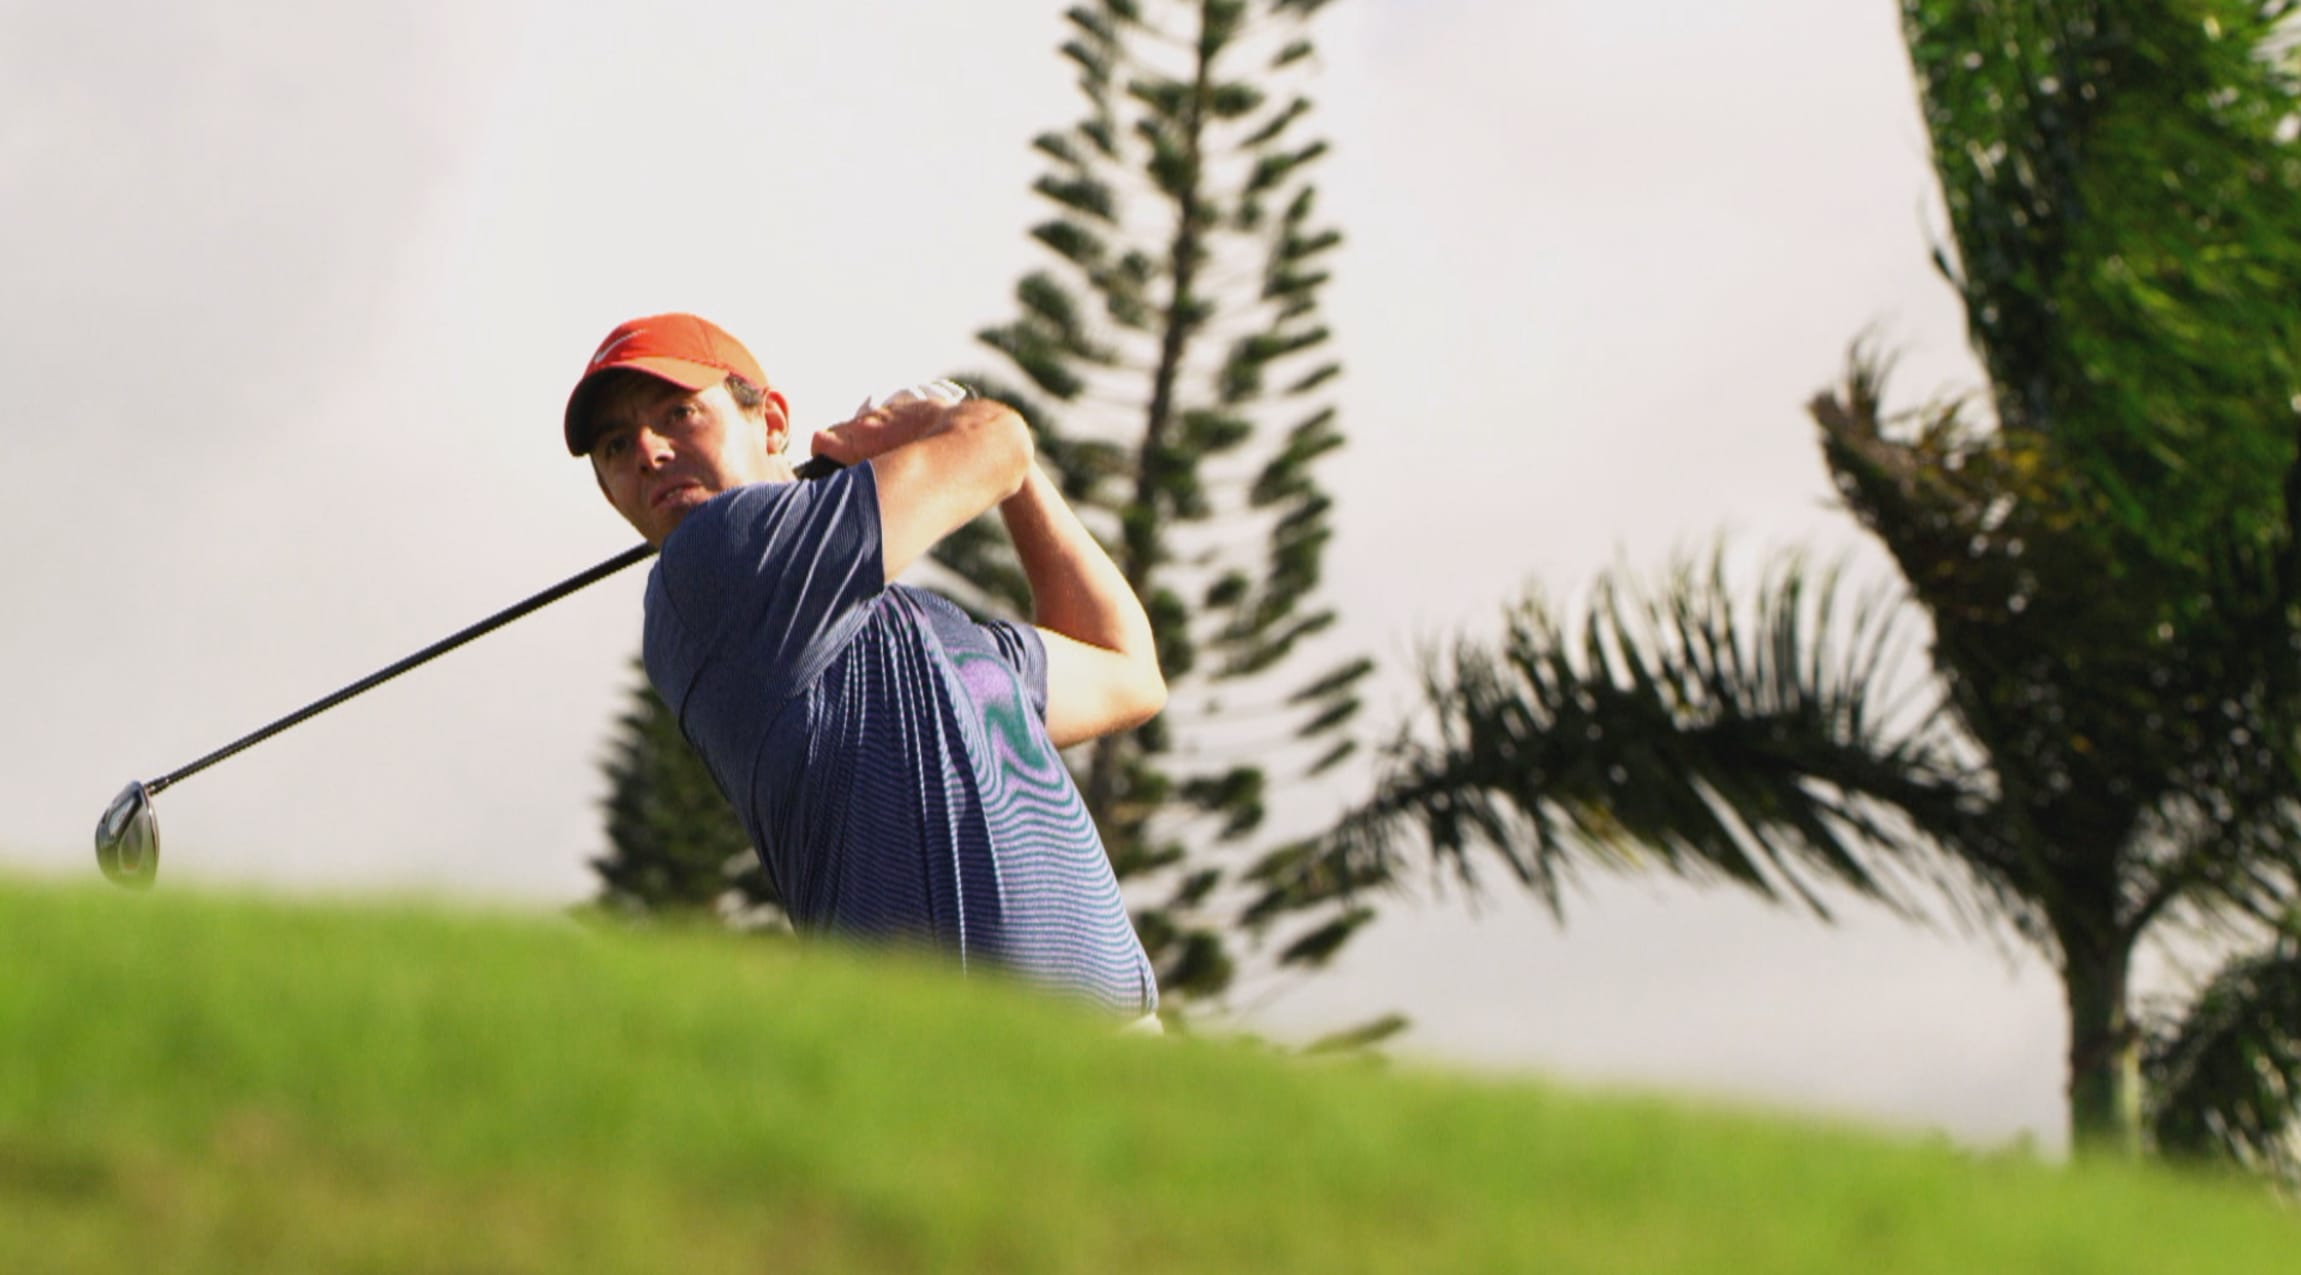 Matt Kuchar PGA TOUR Profile - News, Stats, and Videos